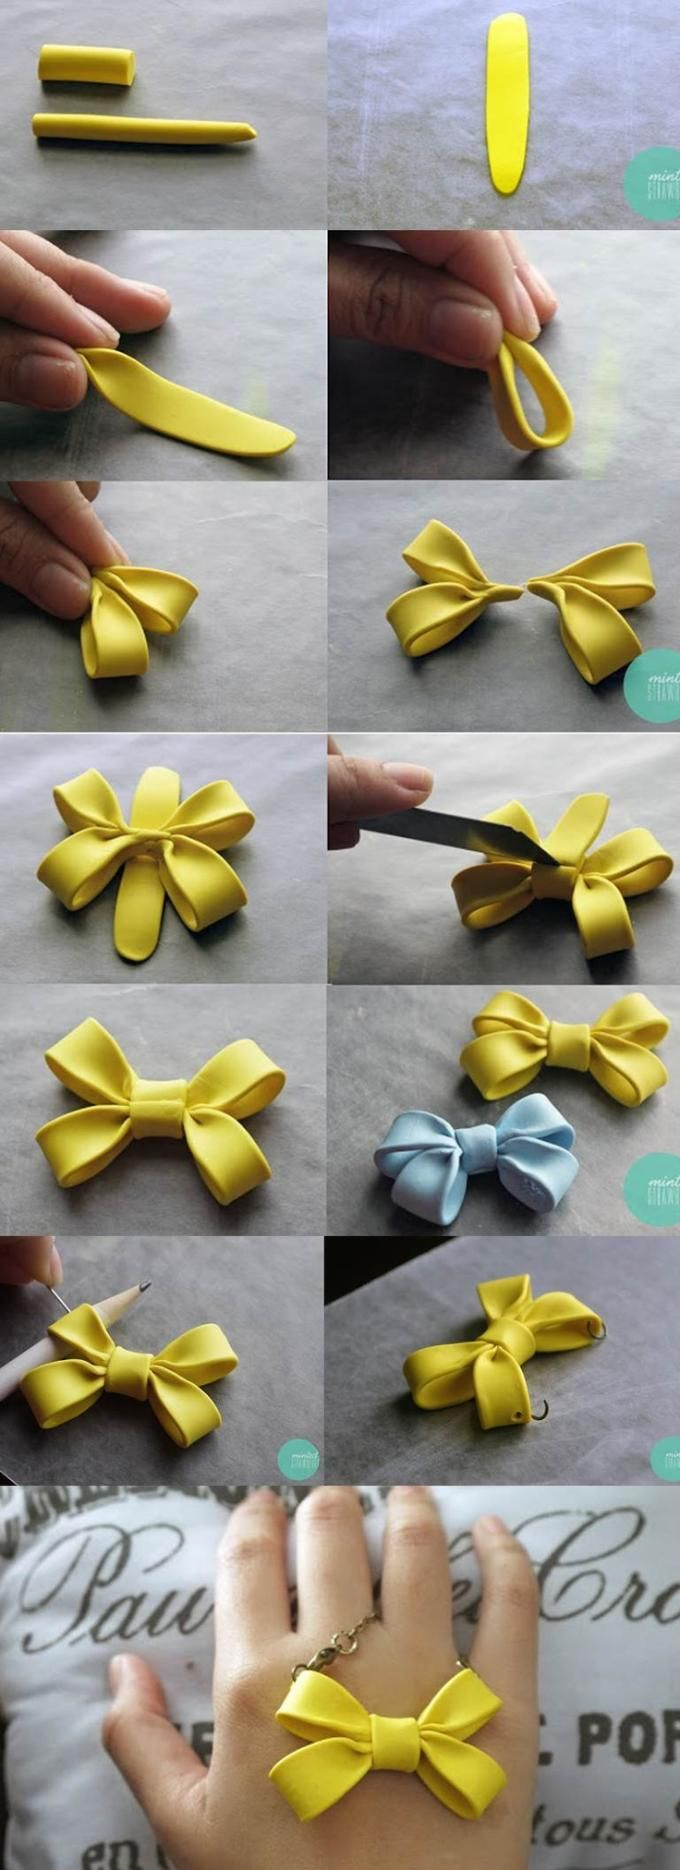 Double Bow Making Idea